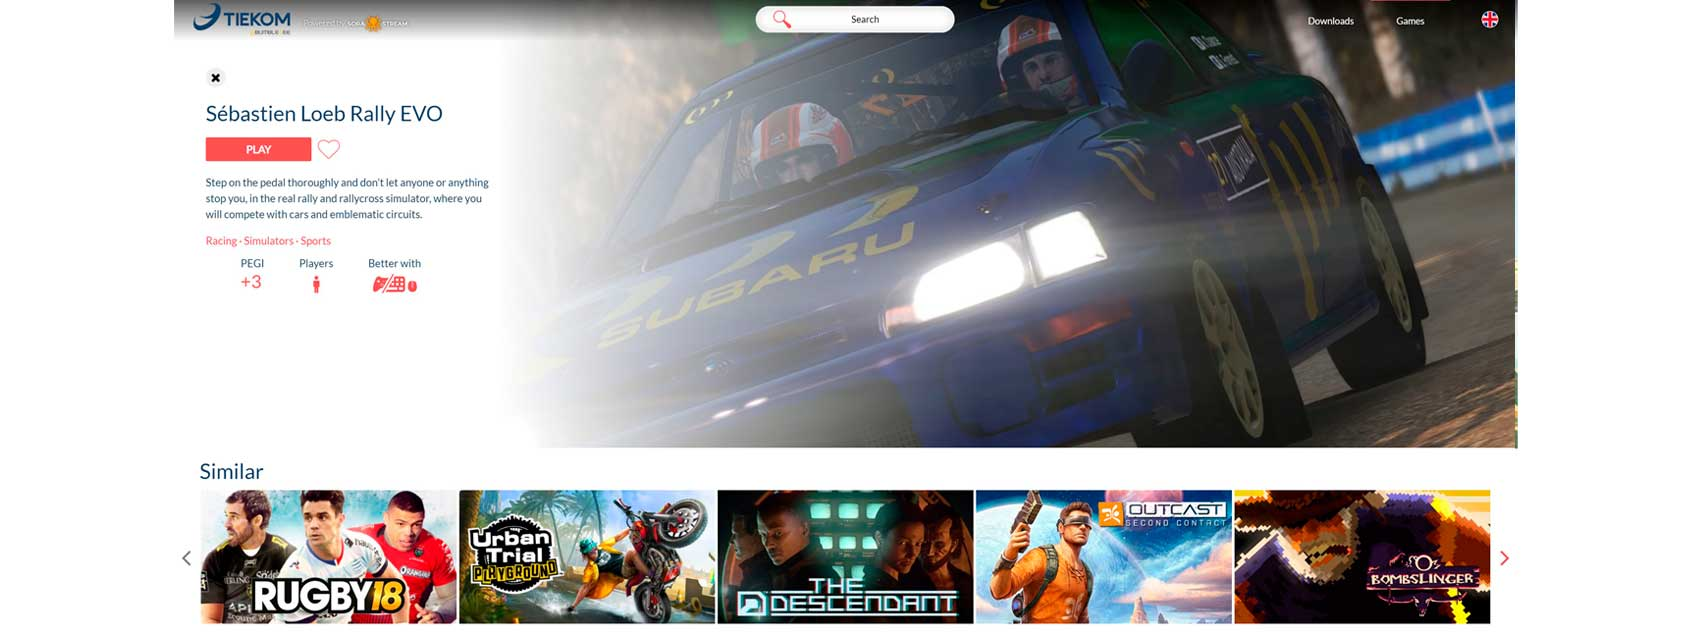 games-platform-03